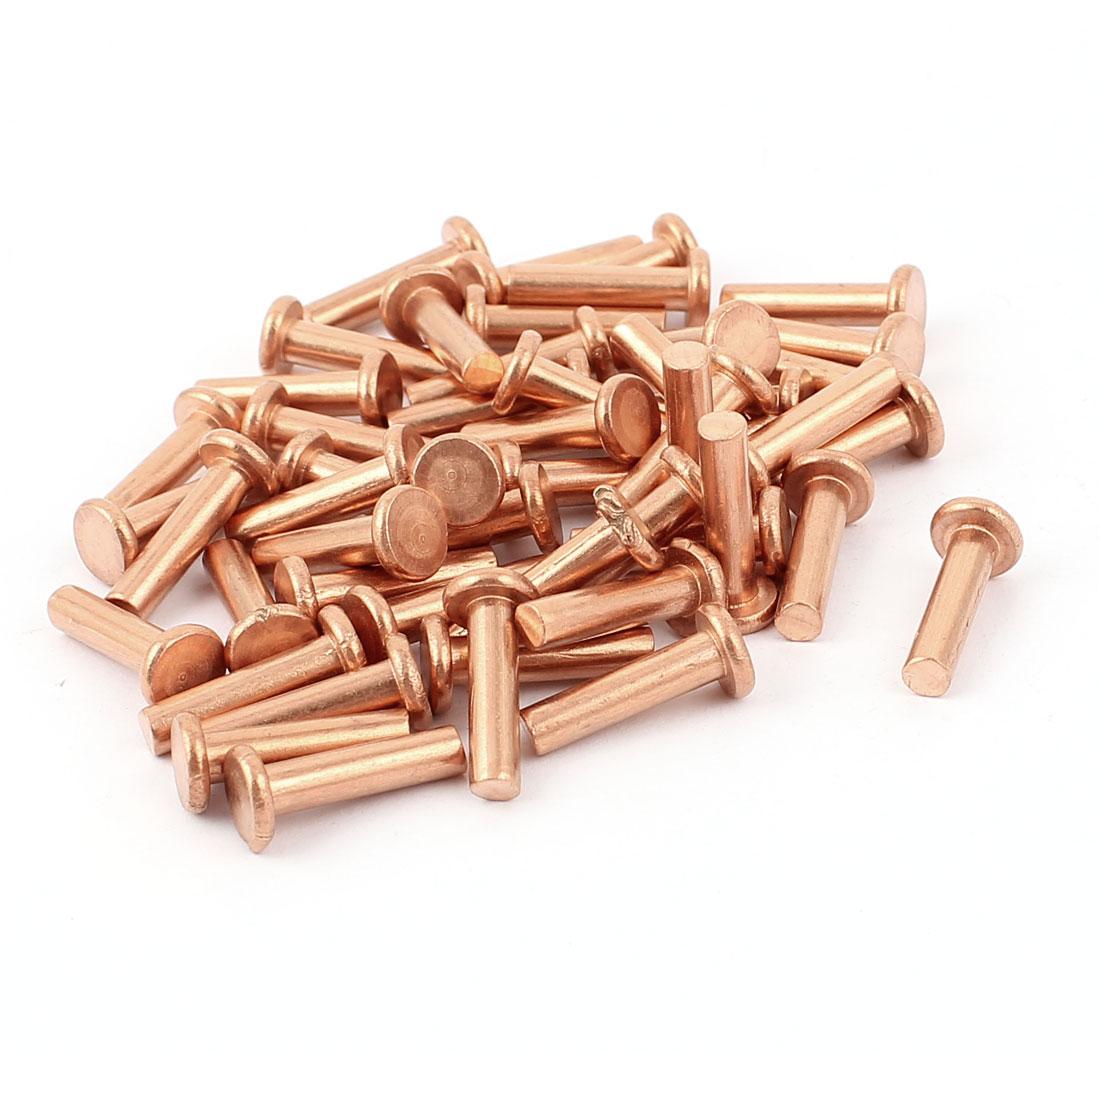 "50 Pcs 5/32"" Diameter 5/8"" Long Shank Flat Head Copper Solid Rivets Fasteners"